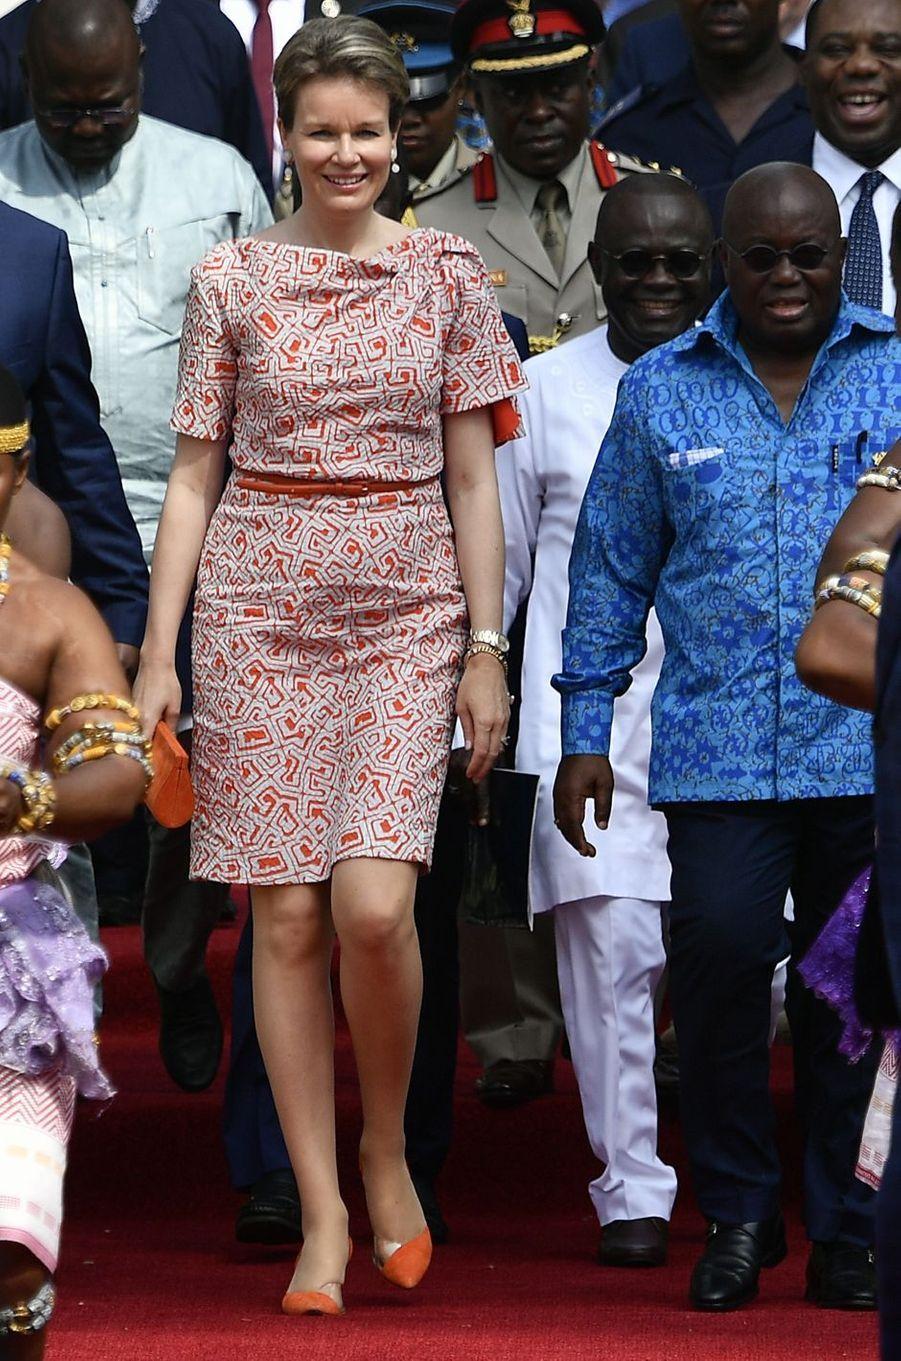 La reine des Belges Mathilde au Ghana, en Natan, le 9 février 2018